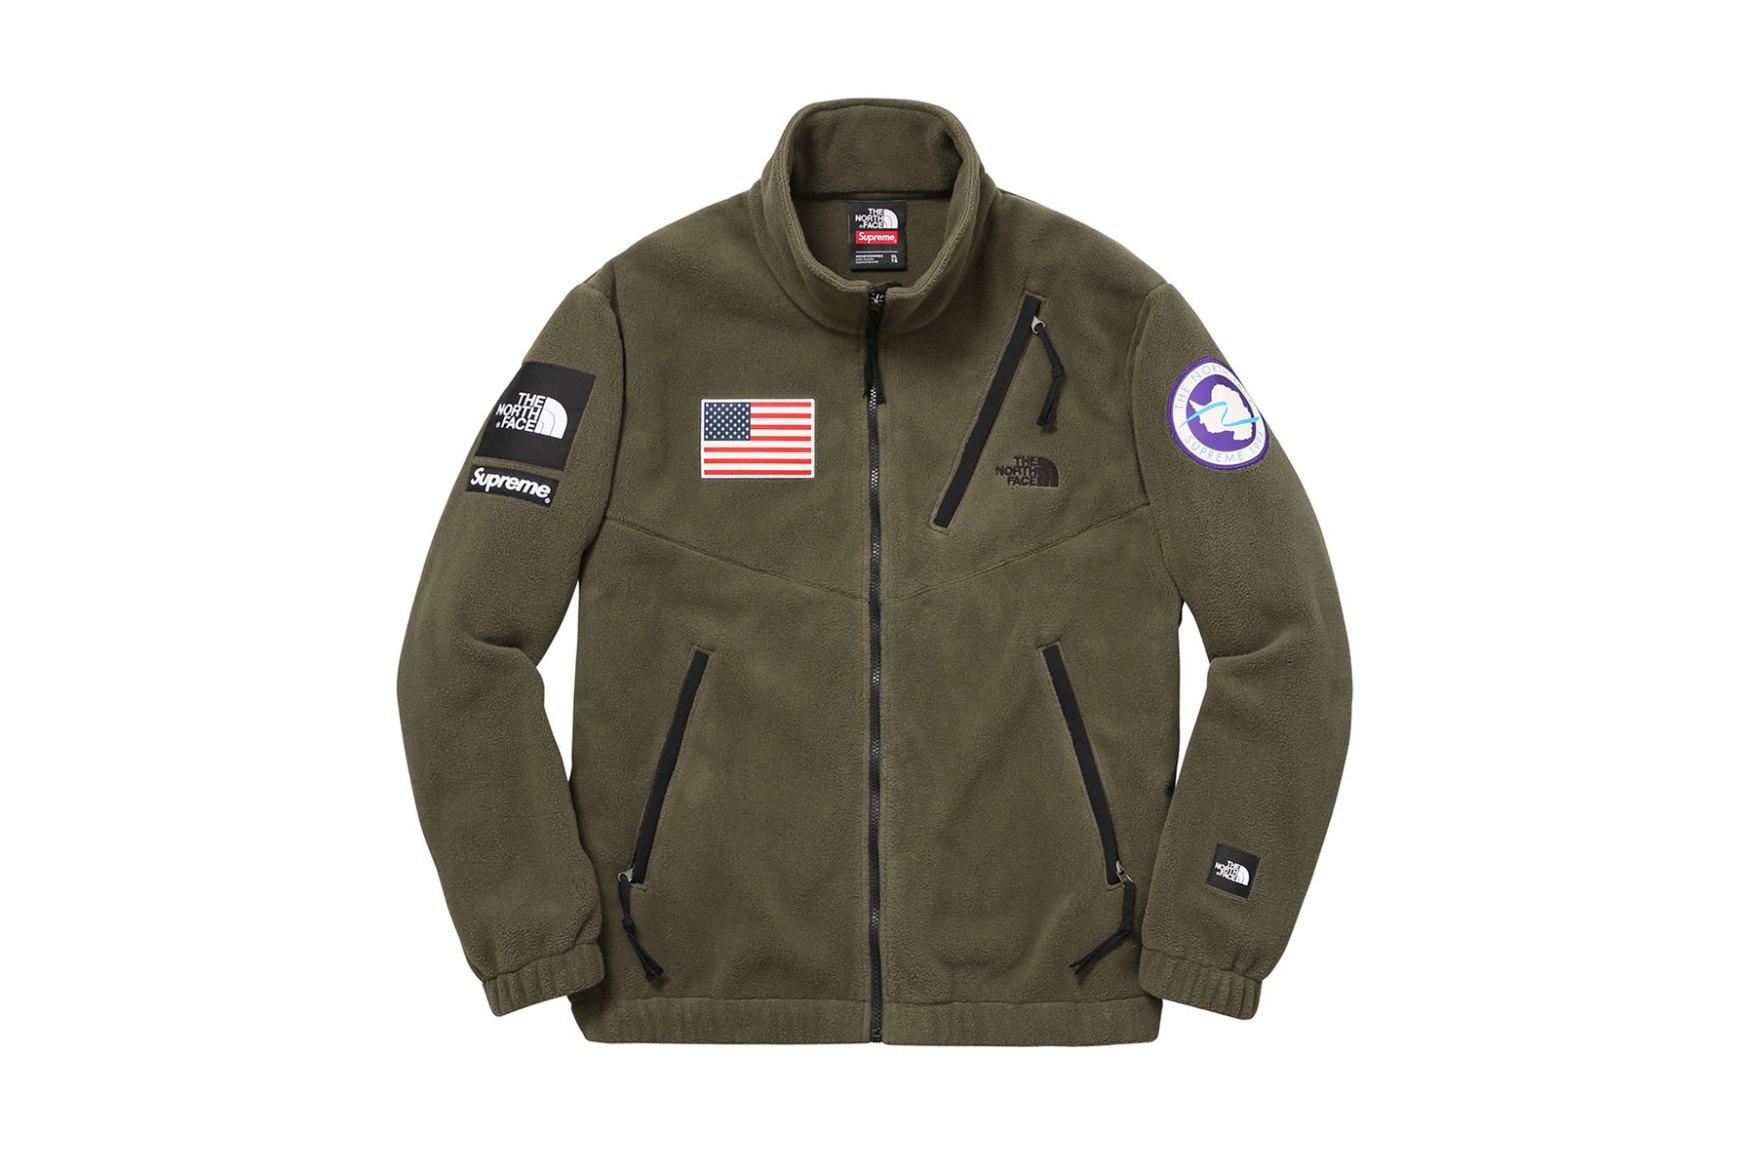 3a665cb98 Supreme x The North Face Polartech Fleece Olive Jacket